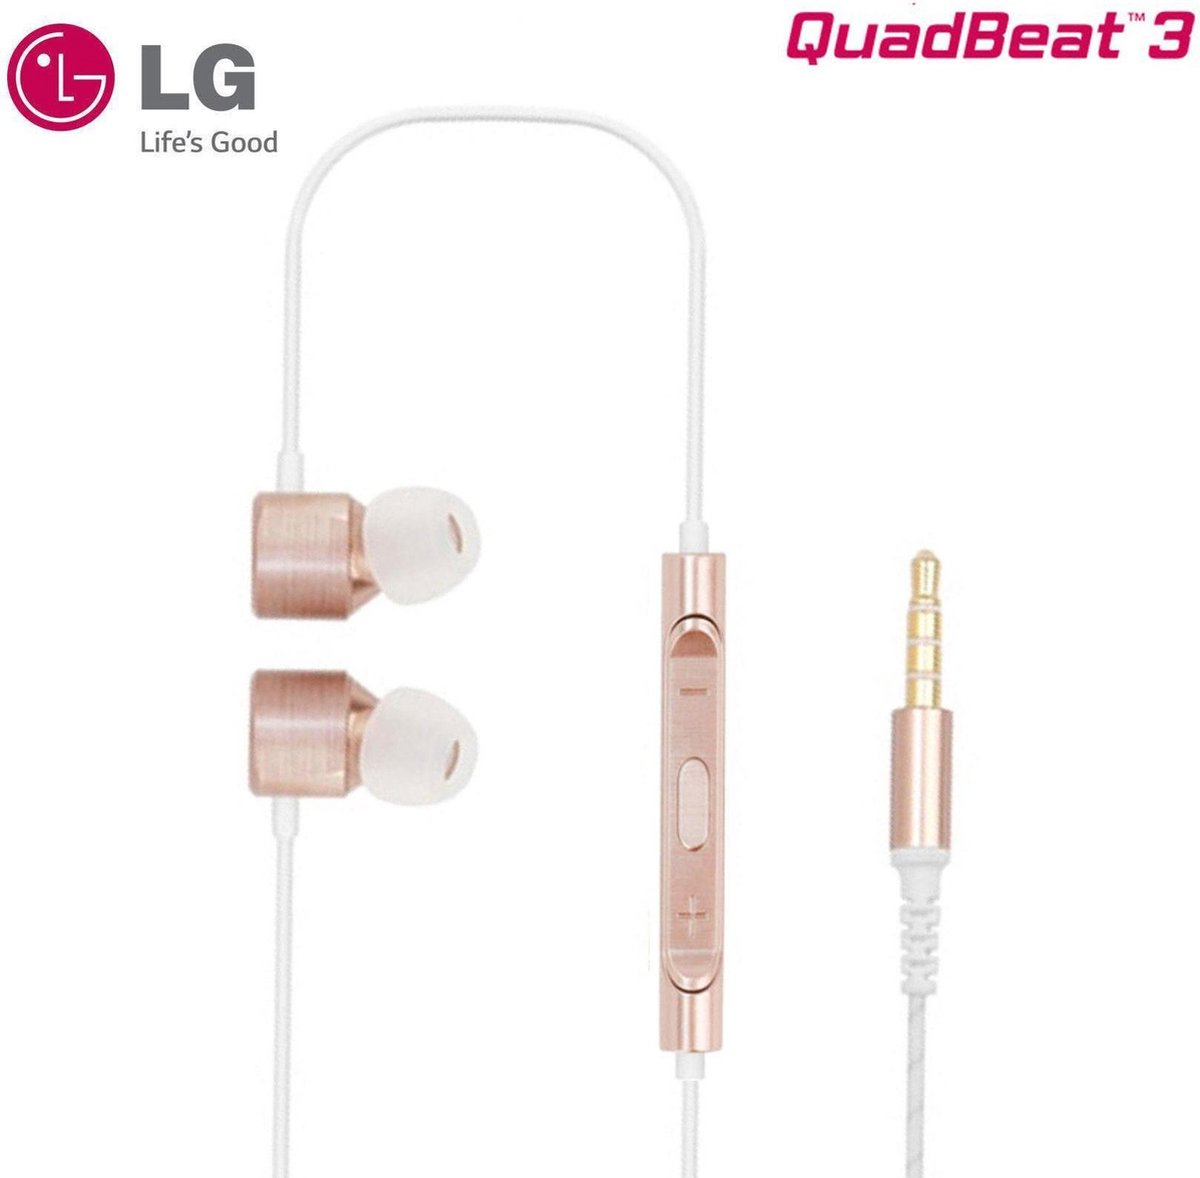 LG Quadbeat 3 In-Ear Stereo Headphones 3.5mm - Goud